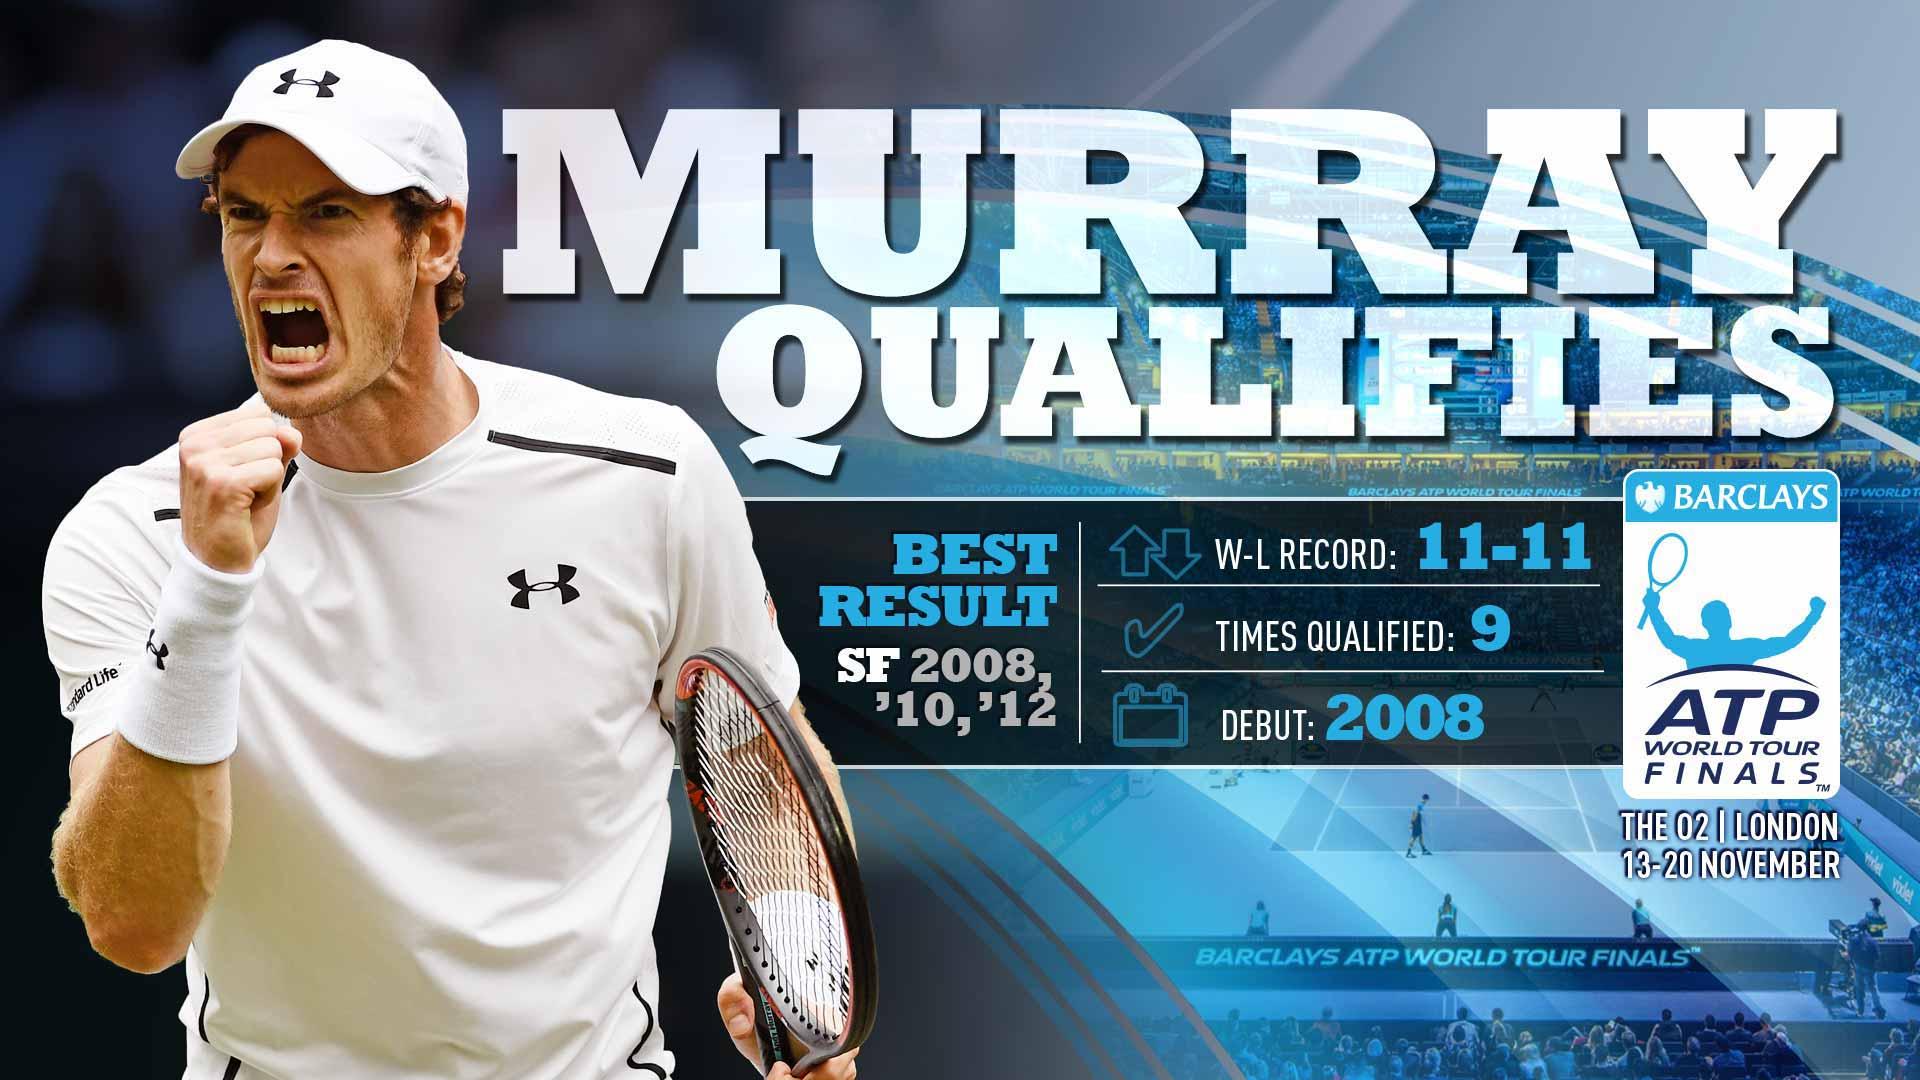 Murray Qualifies For 2016 Barclays Atp World Tour Finals Atp Tour